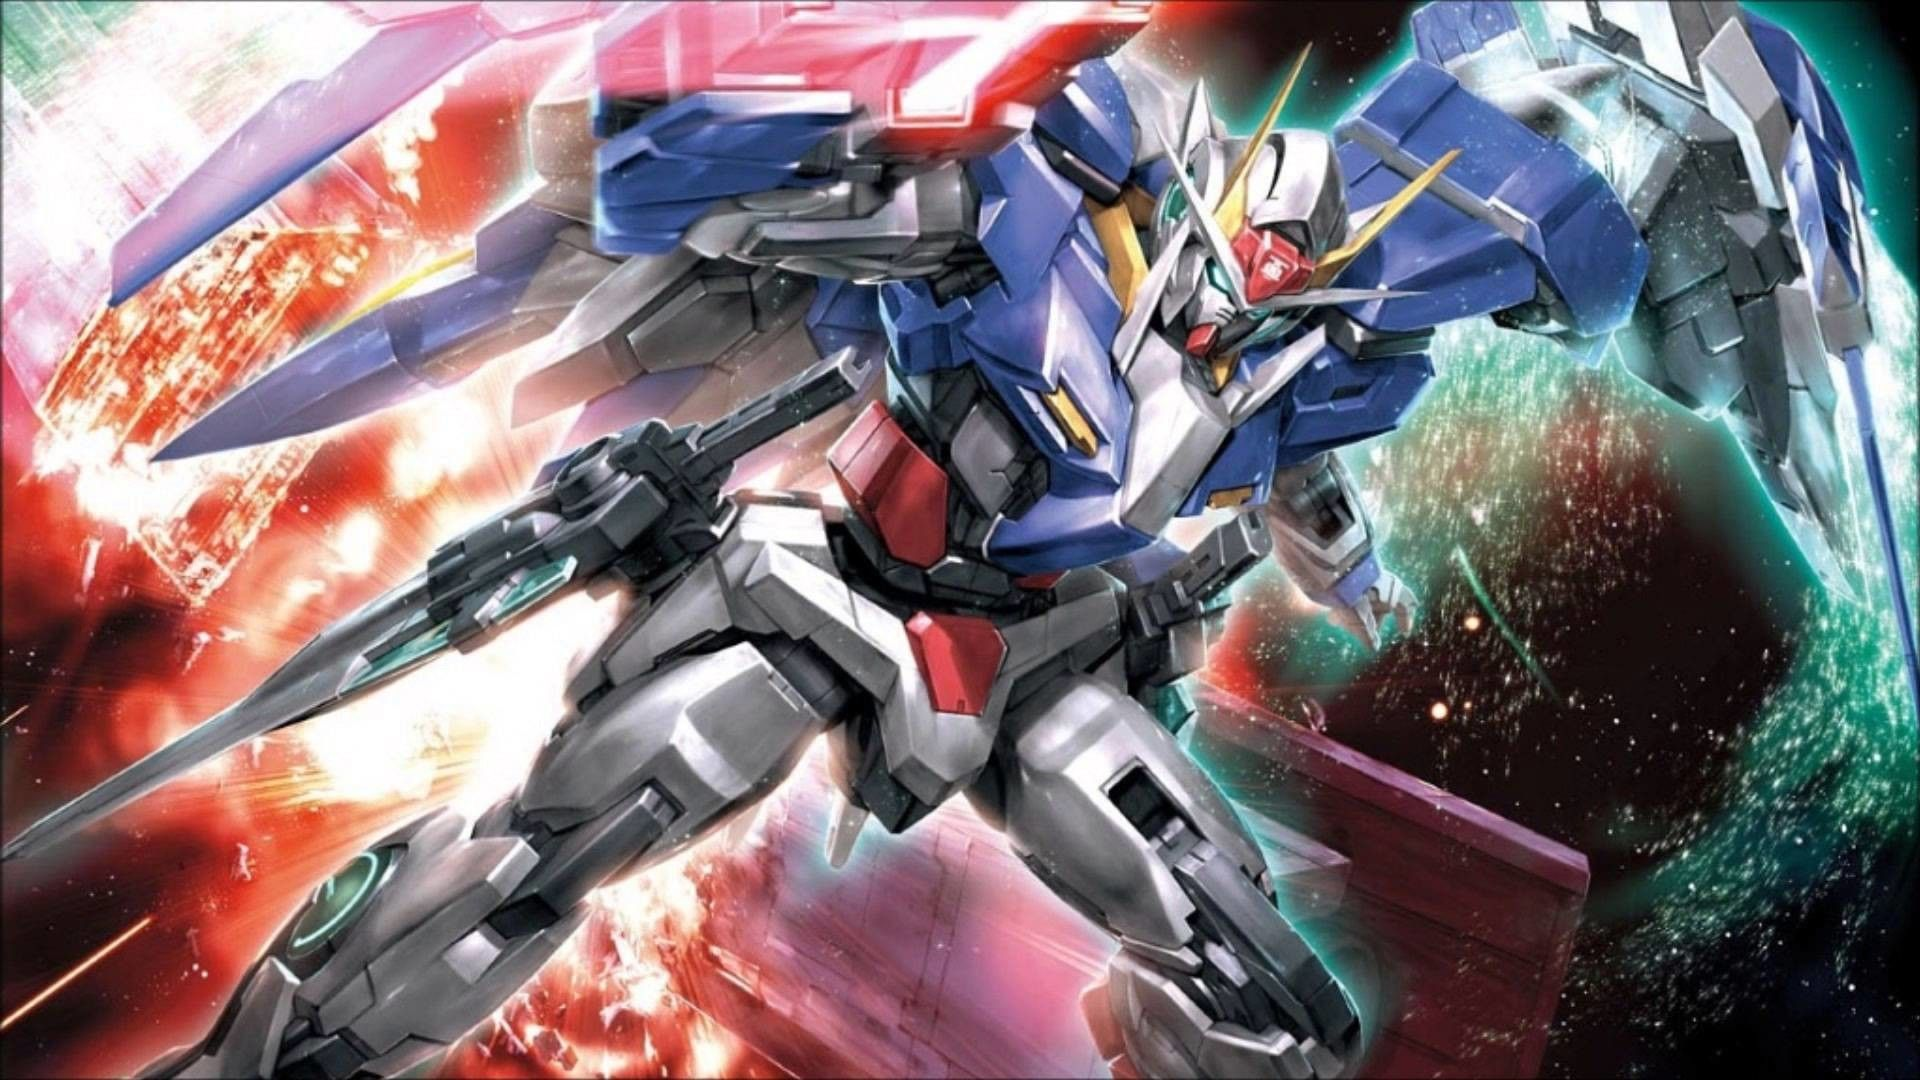 1920x1080 Images For Gundam 00 Raiser Wallpaper Gundam 00 Gundam Wallpapers Gundam Gundam exia wallpaper 4k